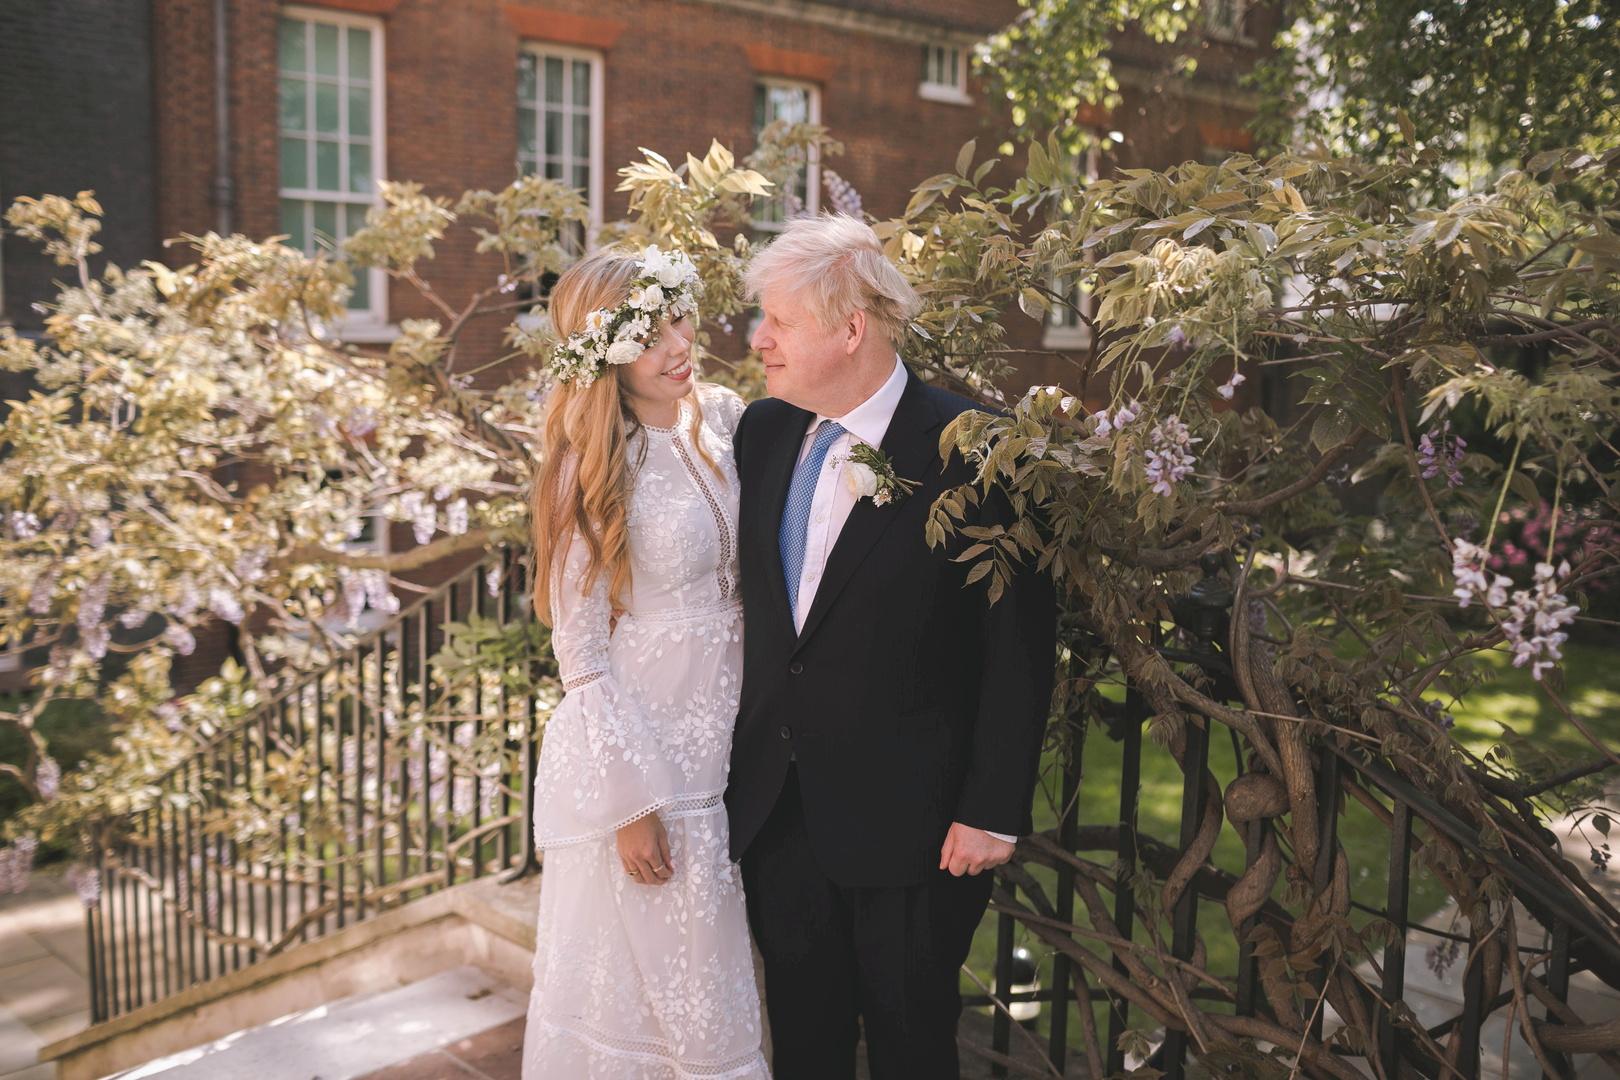 كيف يكون جونسون متزوجا لأول مرة وهو مطلق مرتين؟